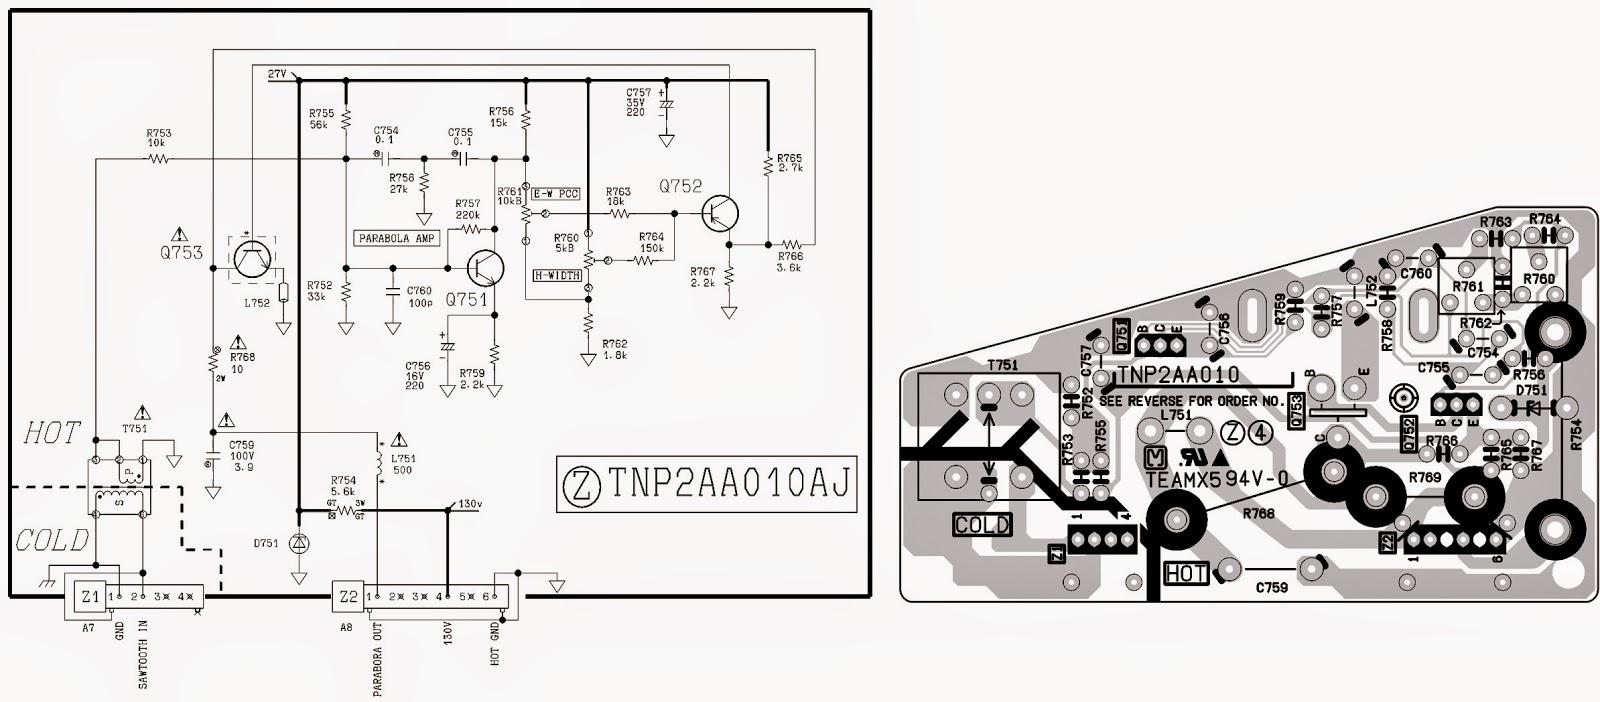 ct 20sx11ce ct 20sx11e panasonic tv circuit diagram. Black Bedroom Furniture Sets. Home Design Ideas